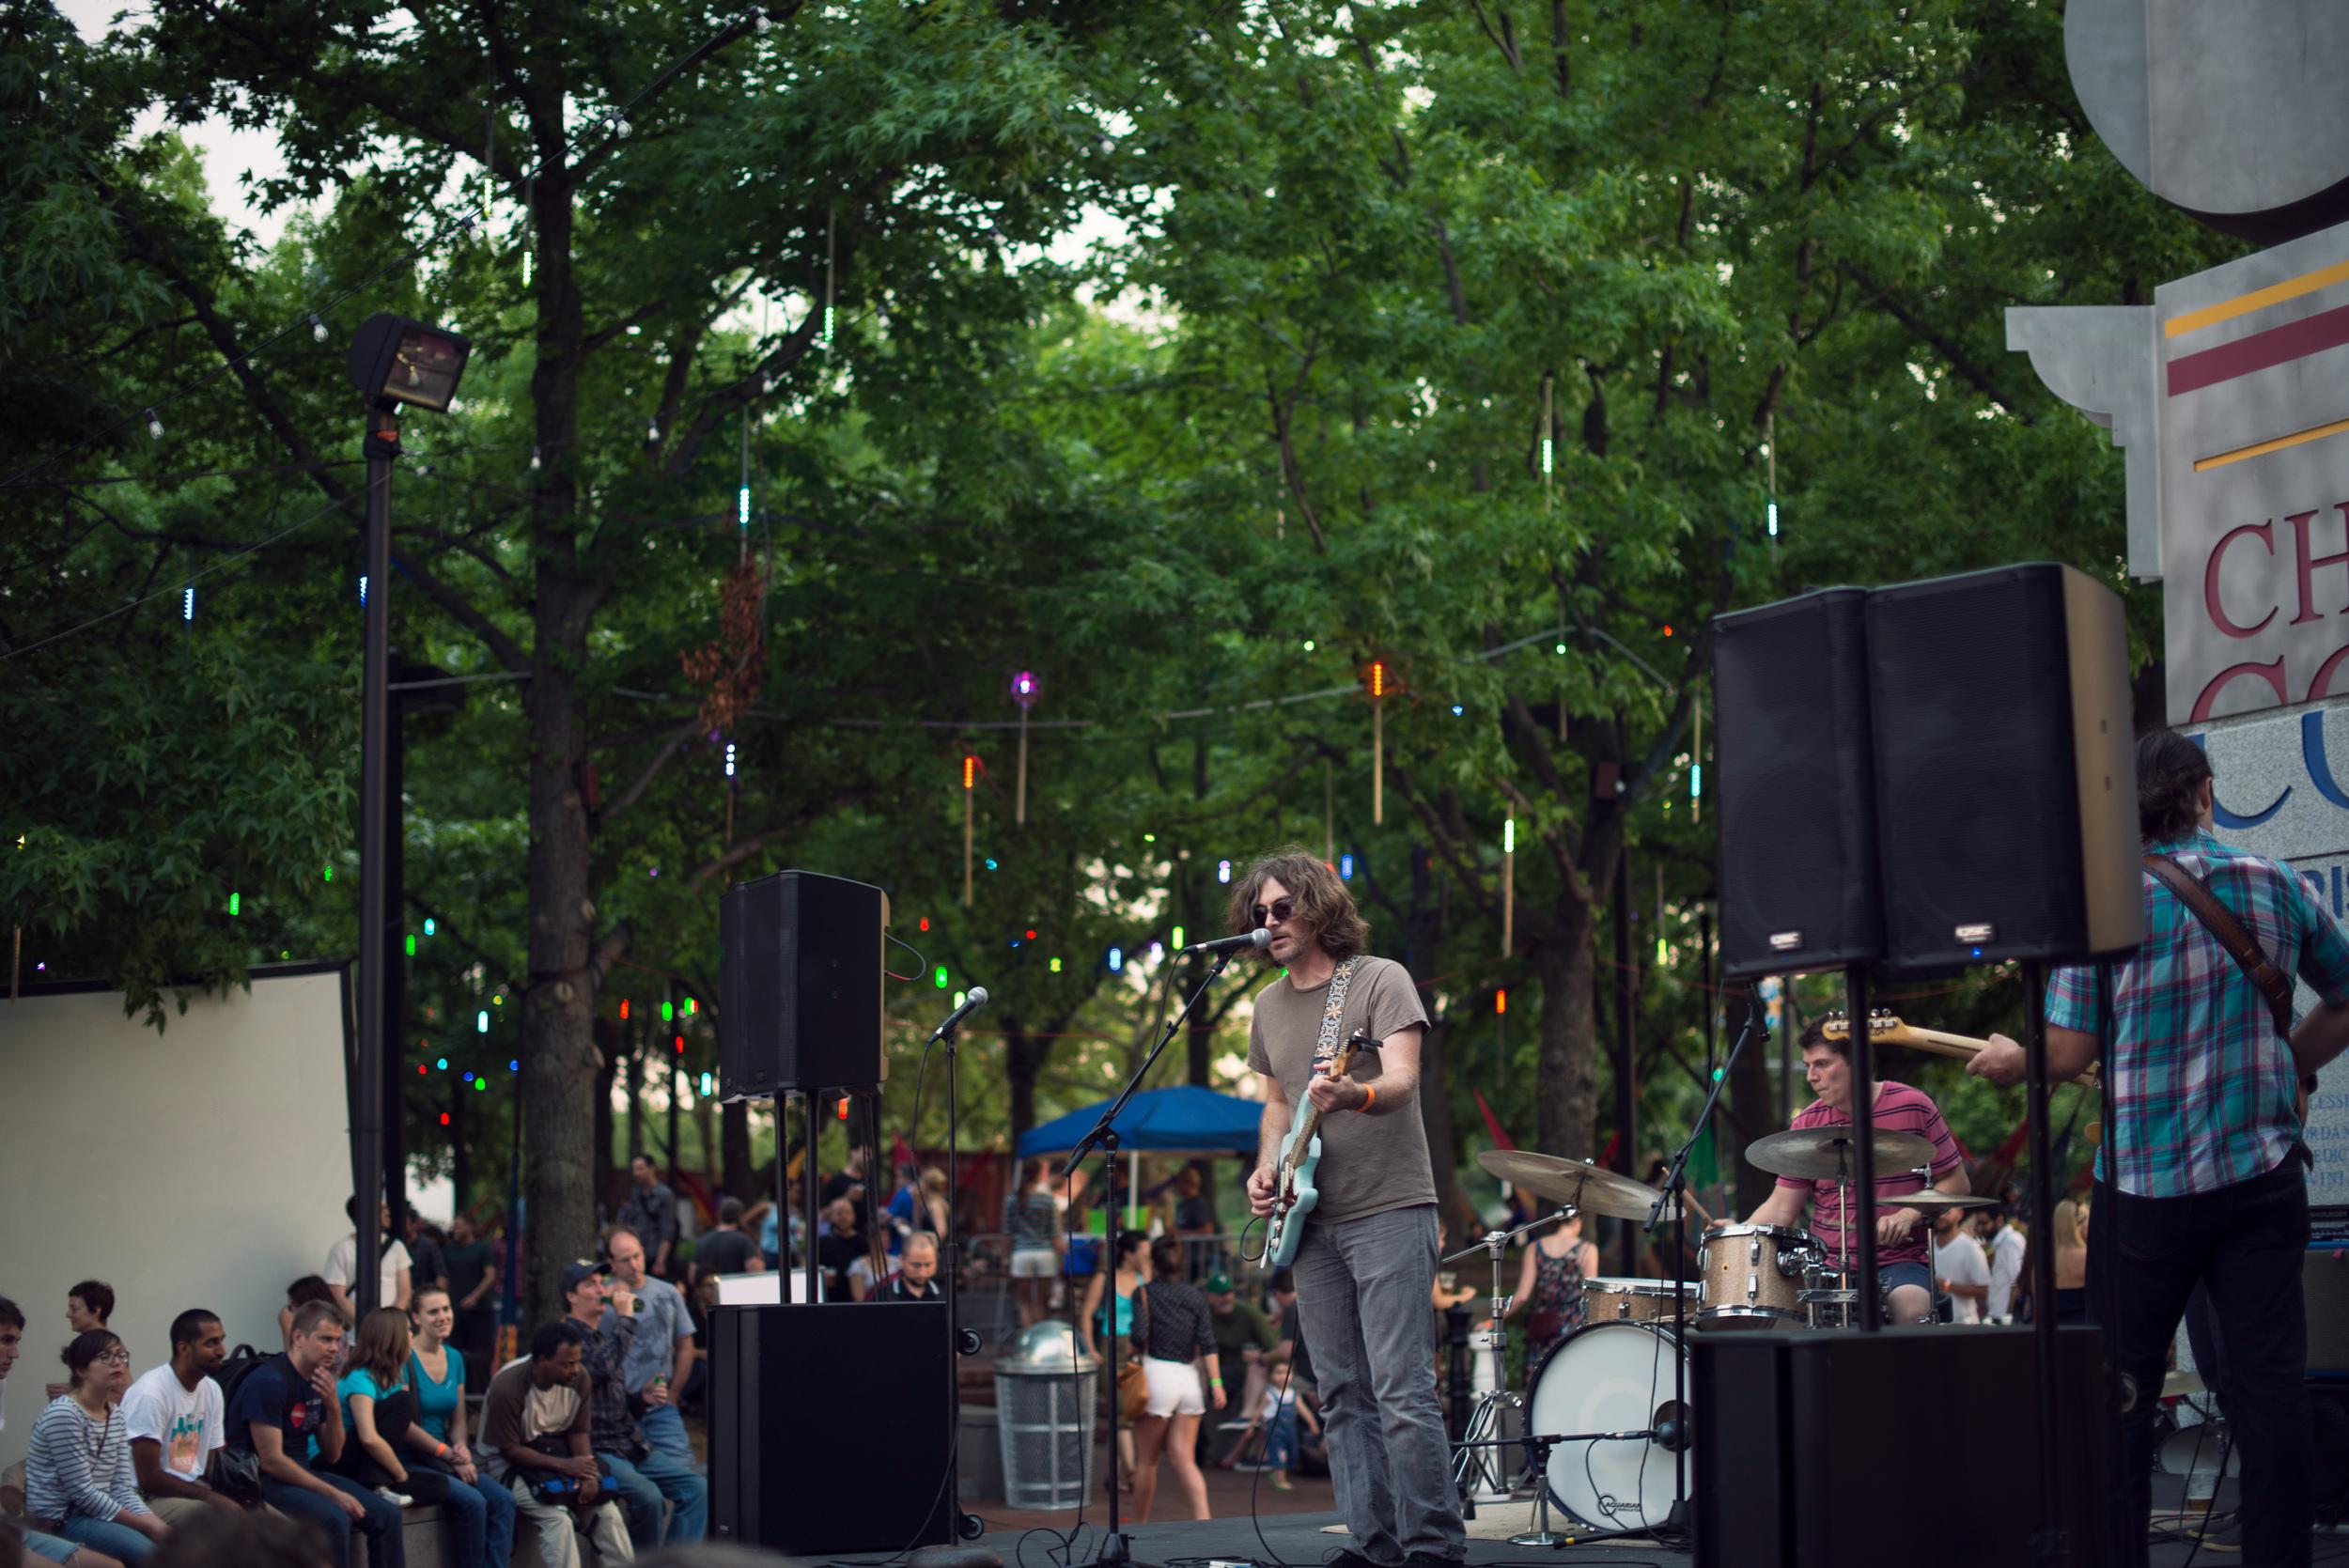 Chris Forsyth at Spruce Street Harbor Park